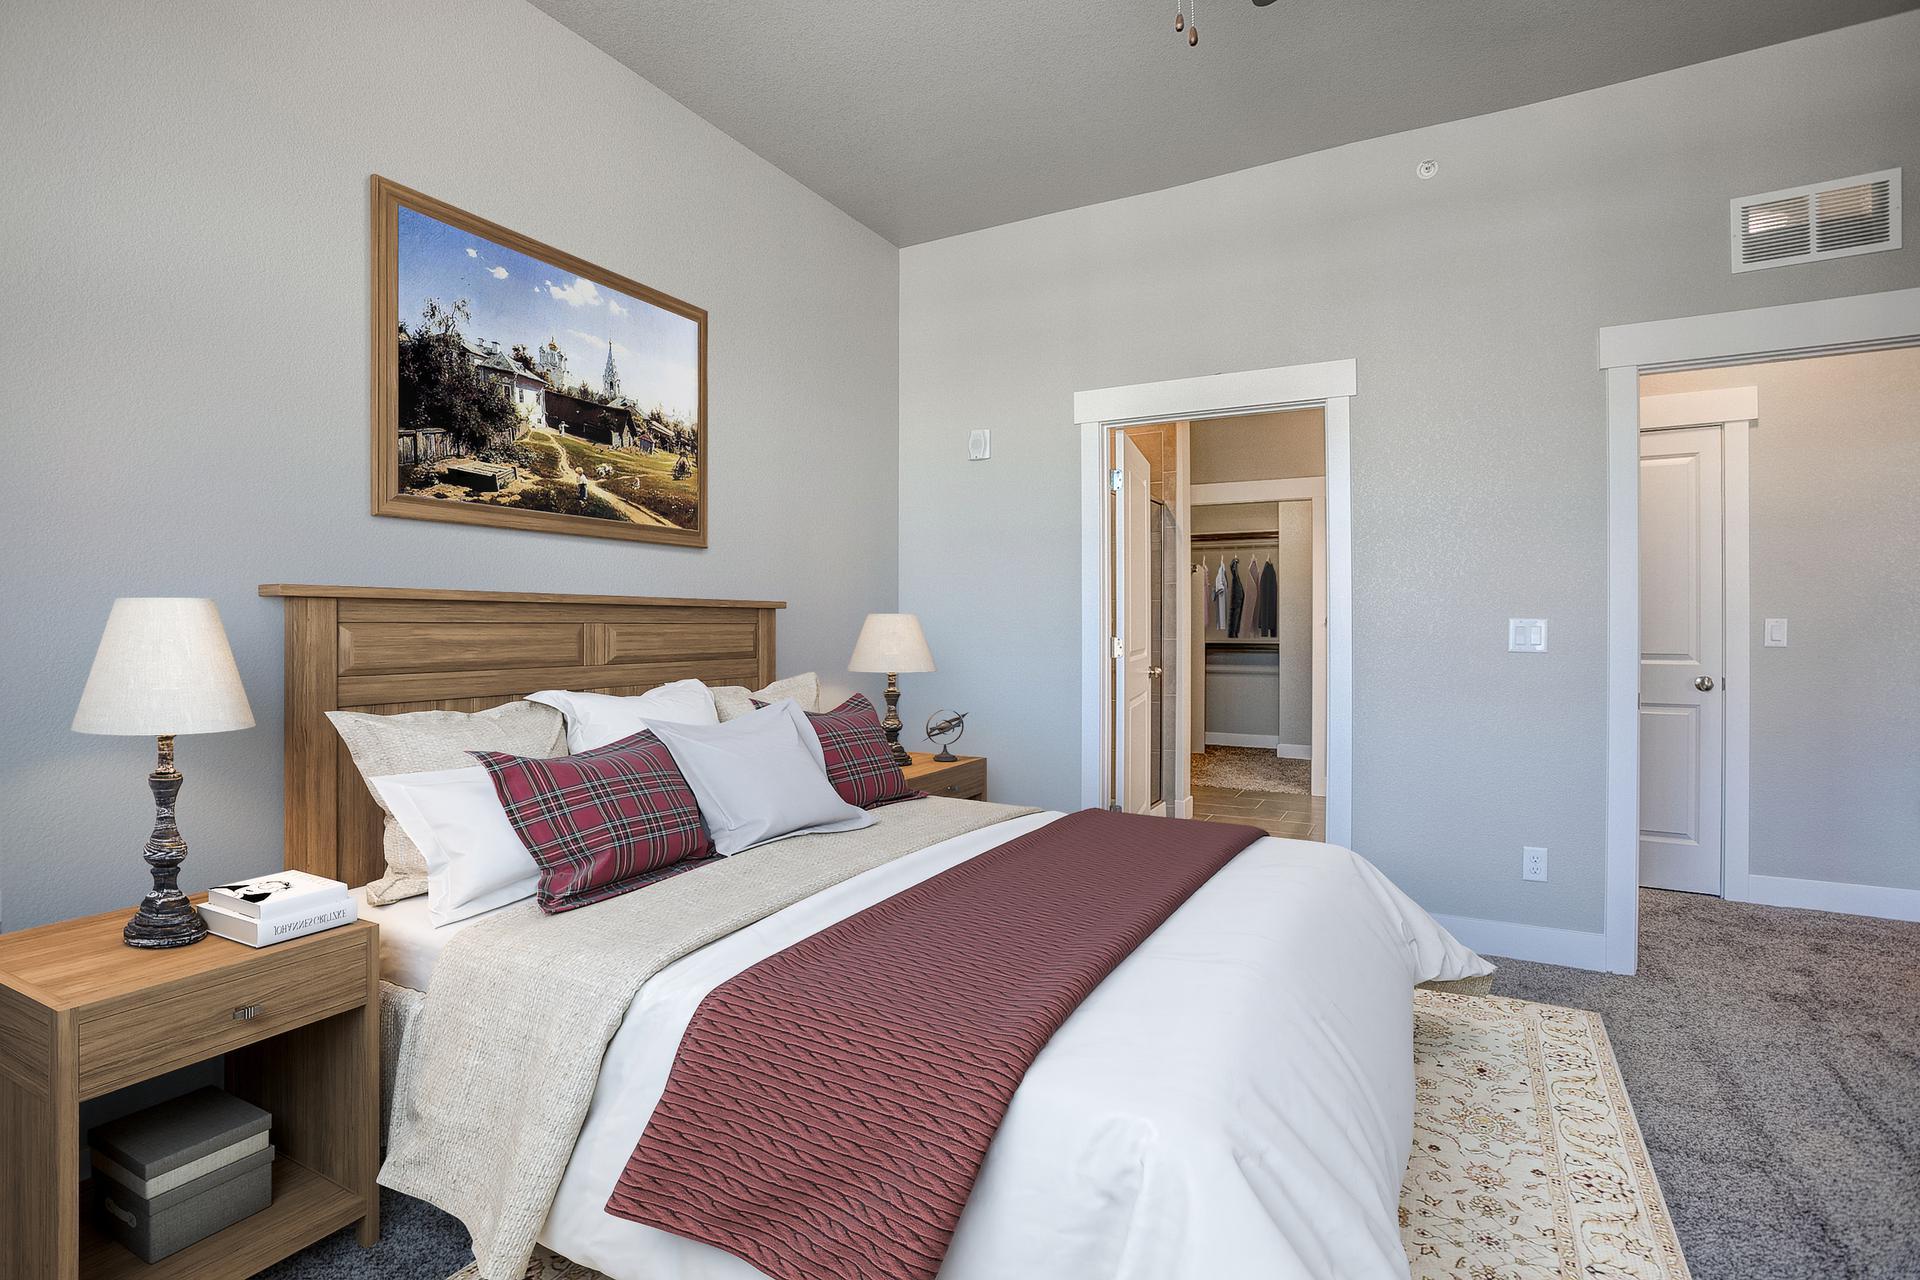 Master Bedroom -  Previous Cambridge Floor Plan. 1,435sf New Home